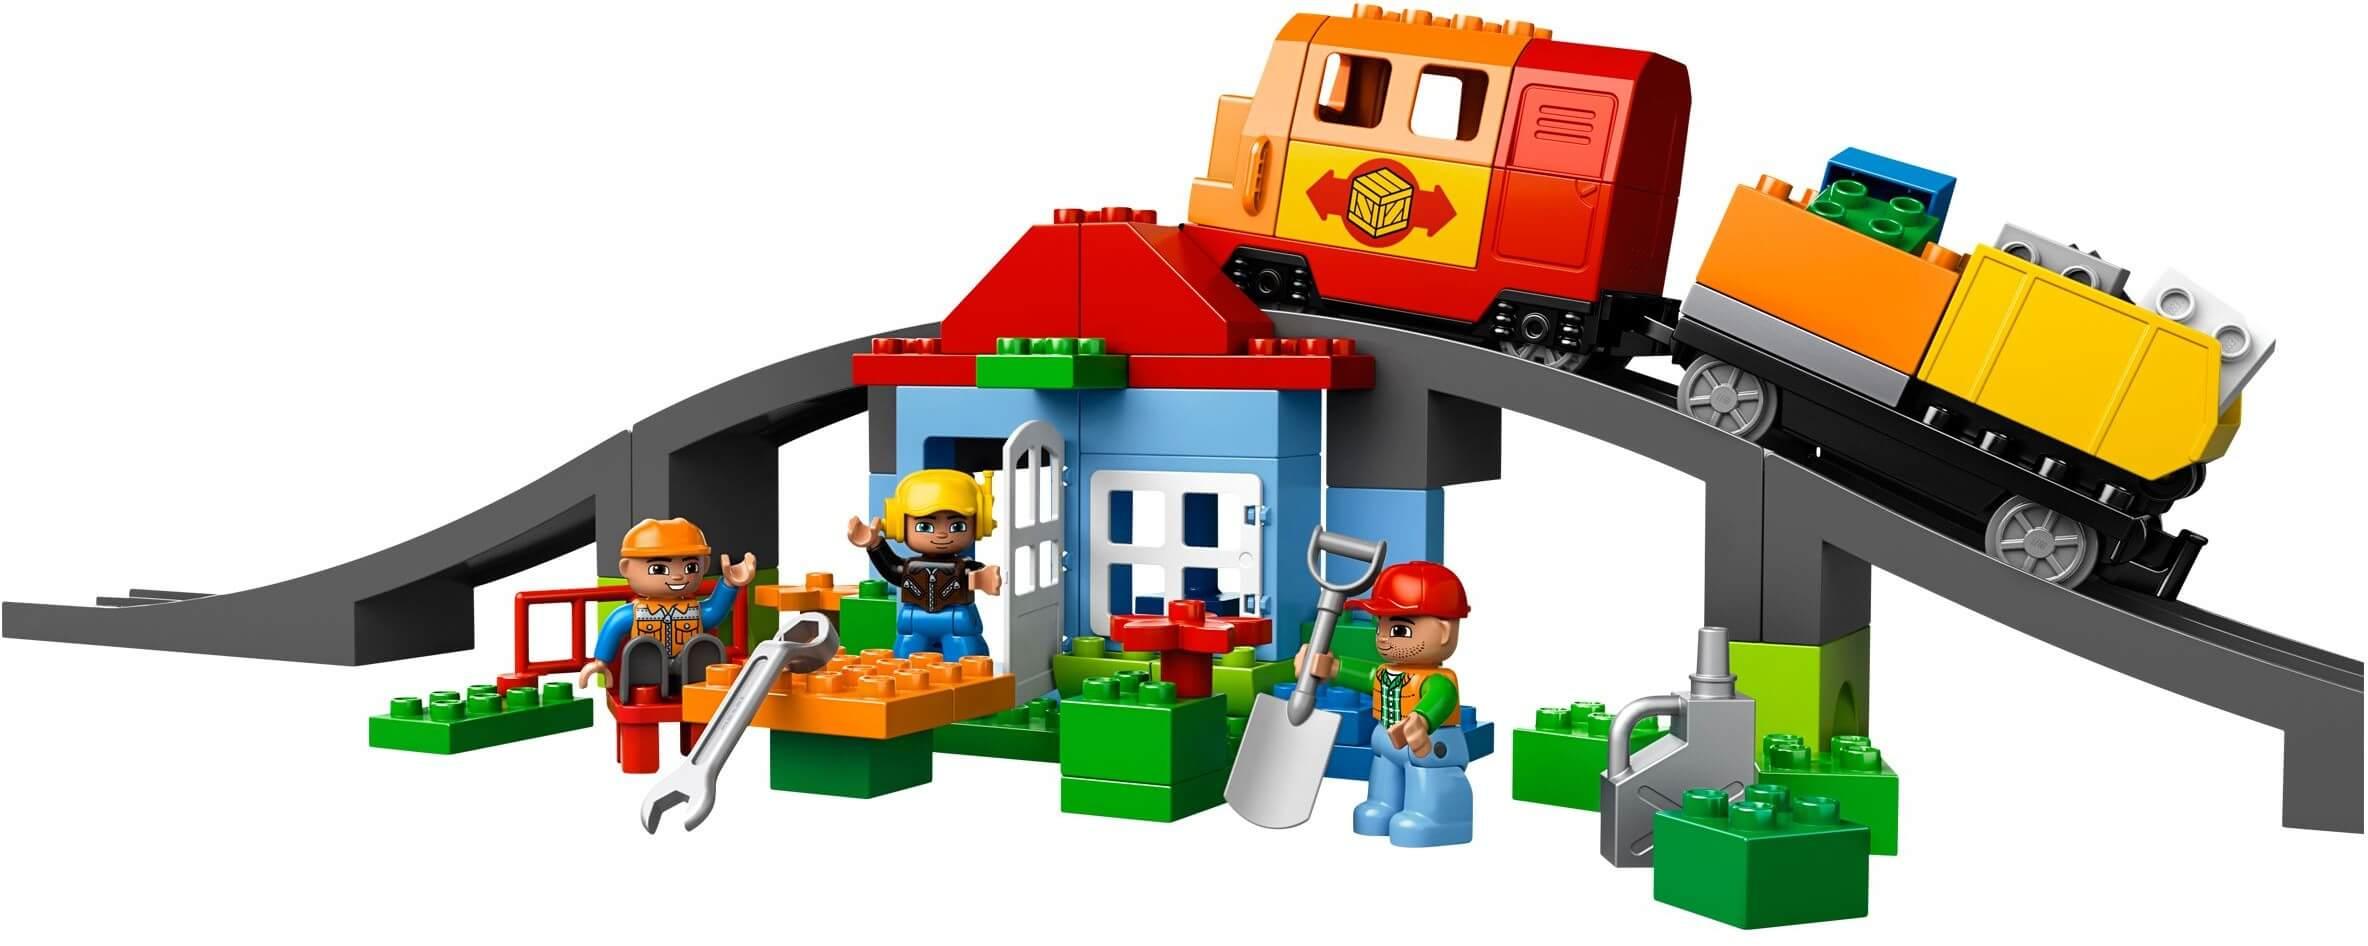 Mua đồ chơi LEGO 10508 - LEGO DUPLO 10508 - Bộ Xe Lửa Cao Cấp (LEGO DUPLO Deluxe Train Set 10508)